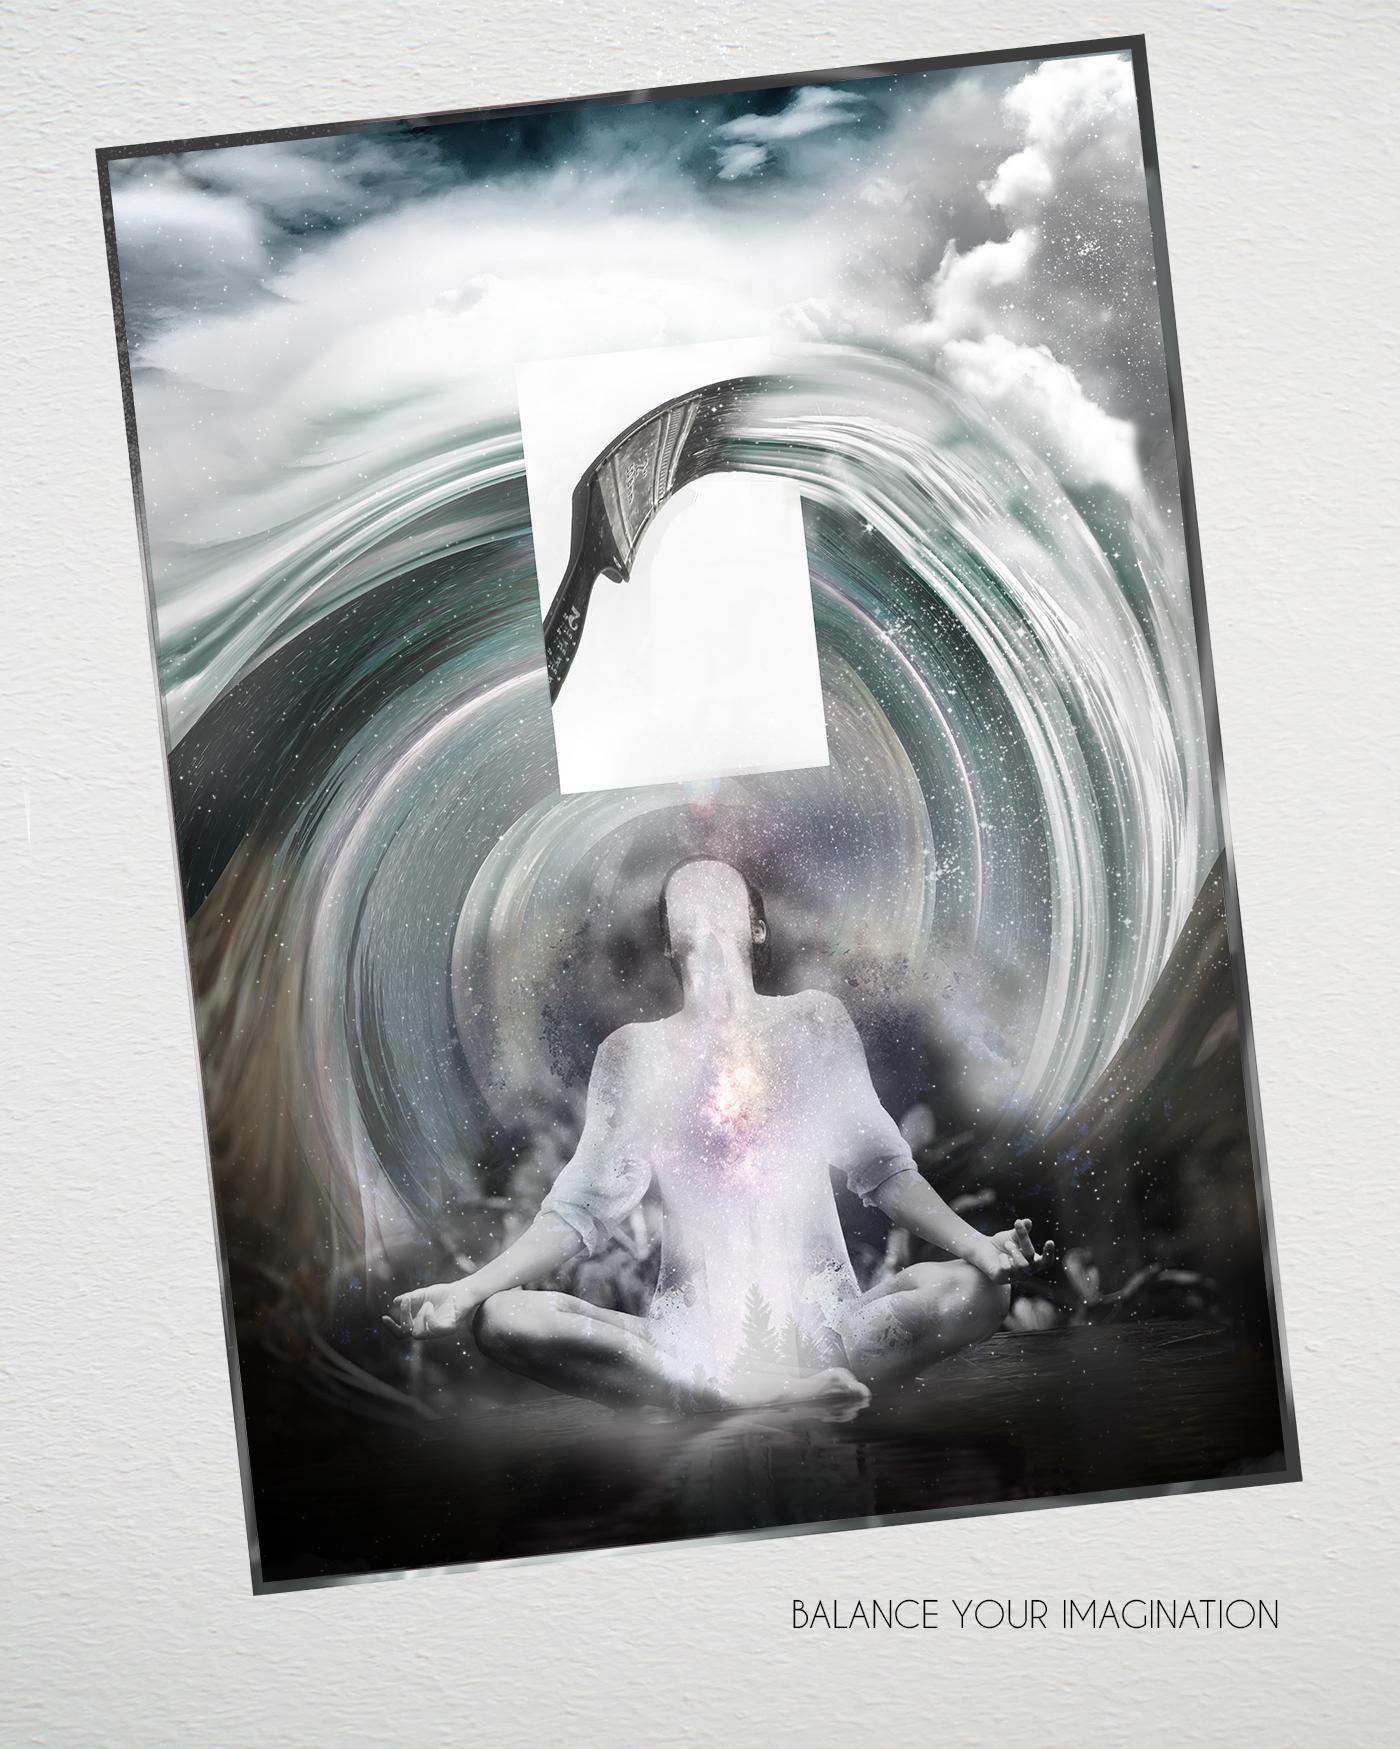 Balance Your Imagination Design.